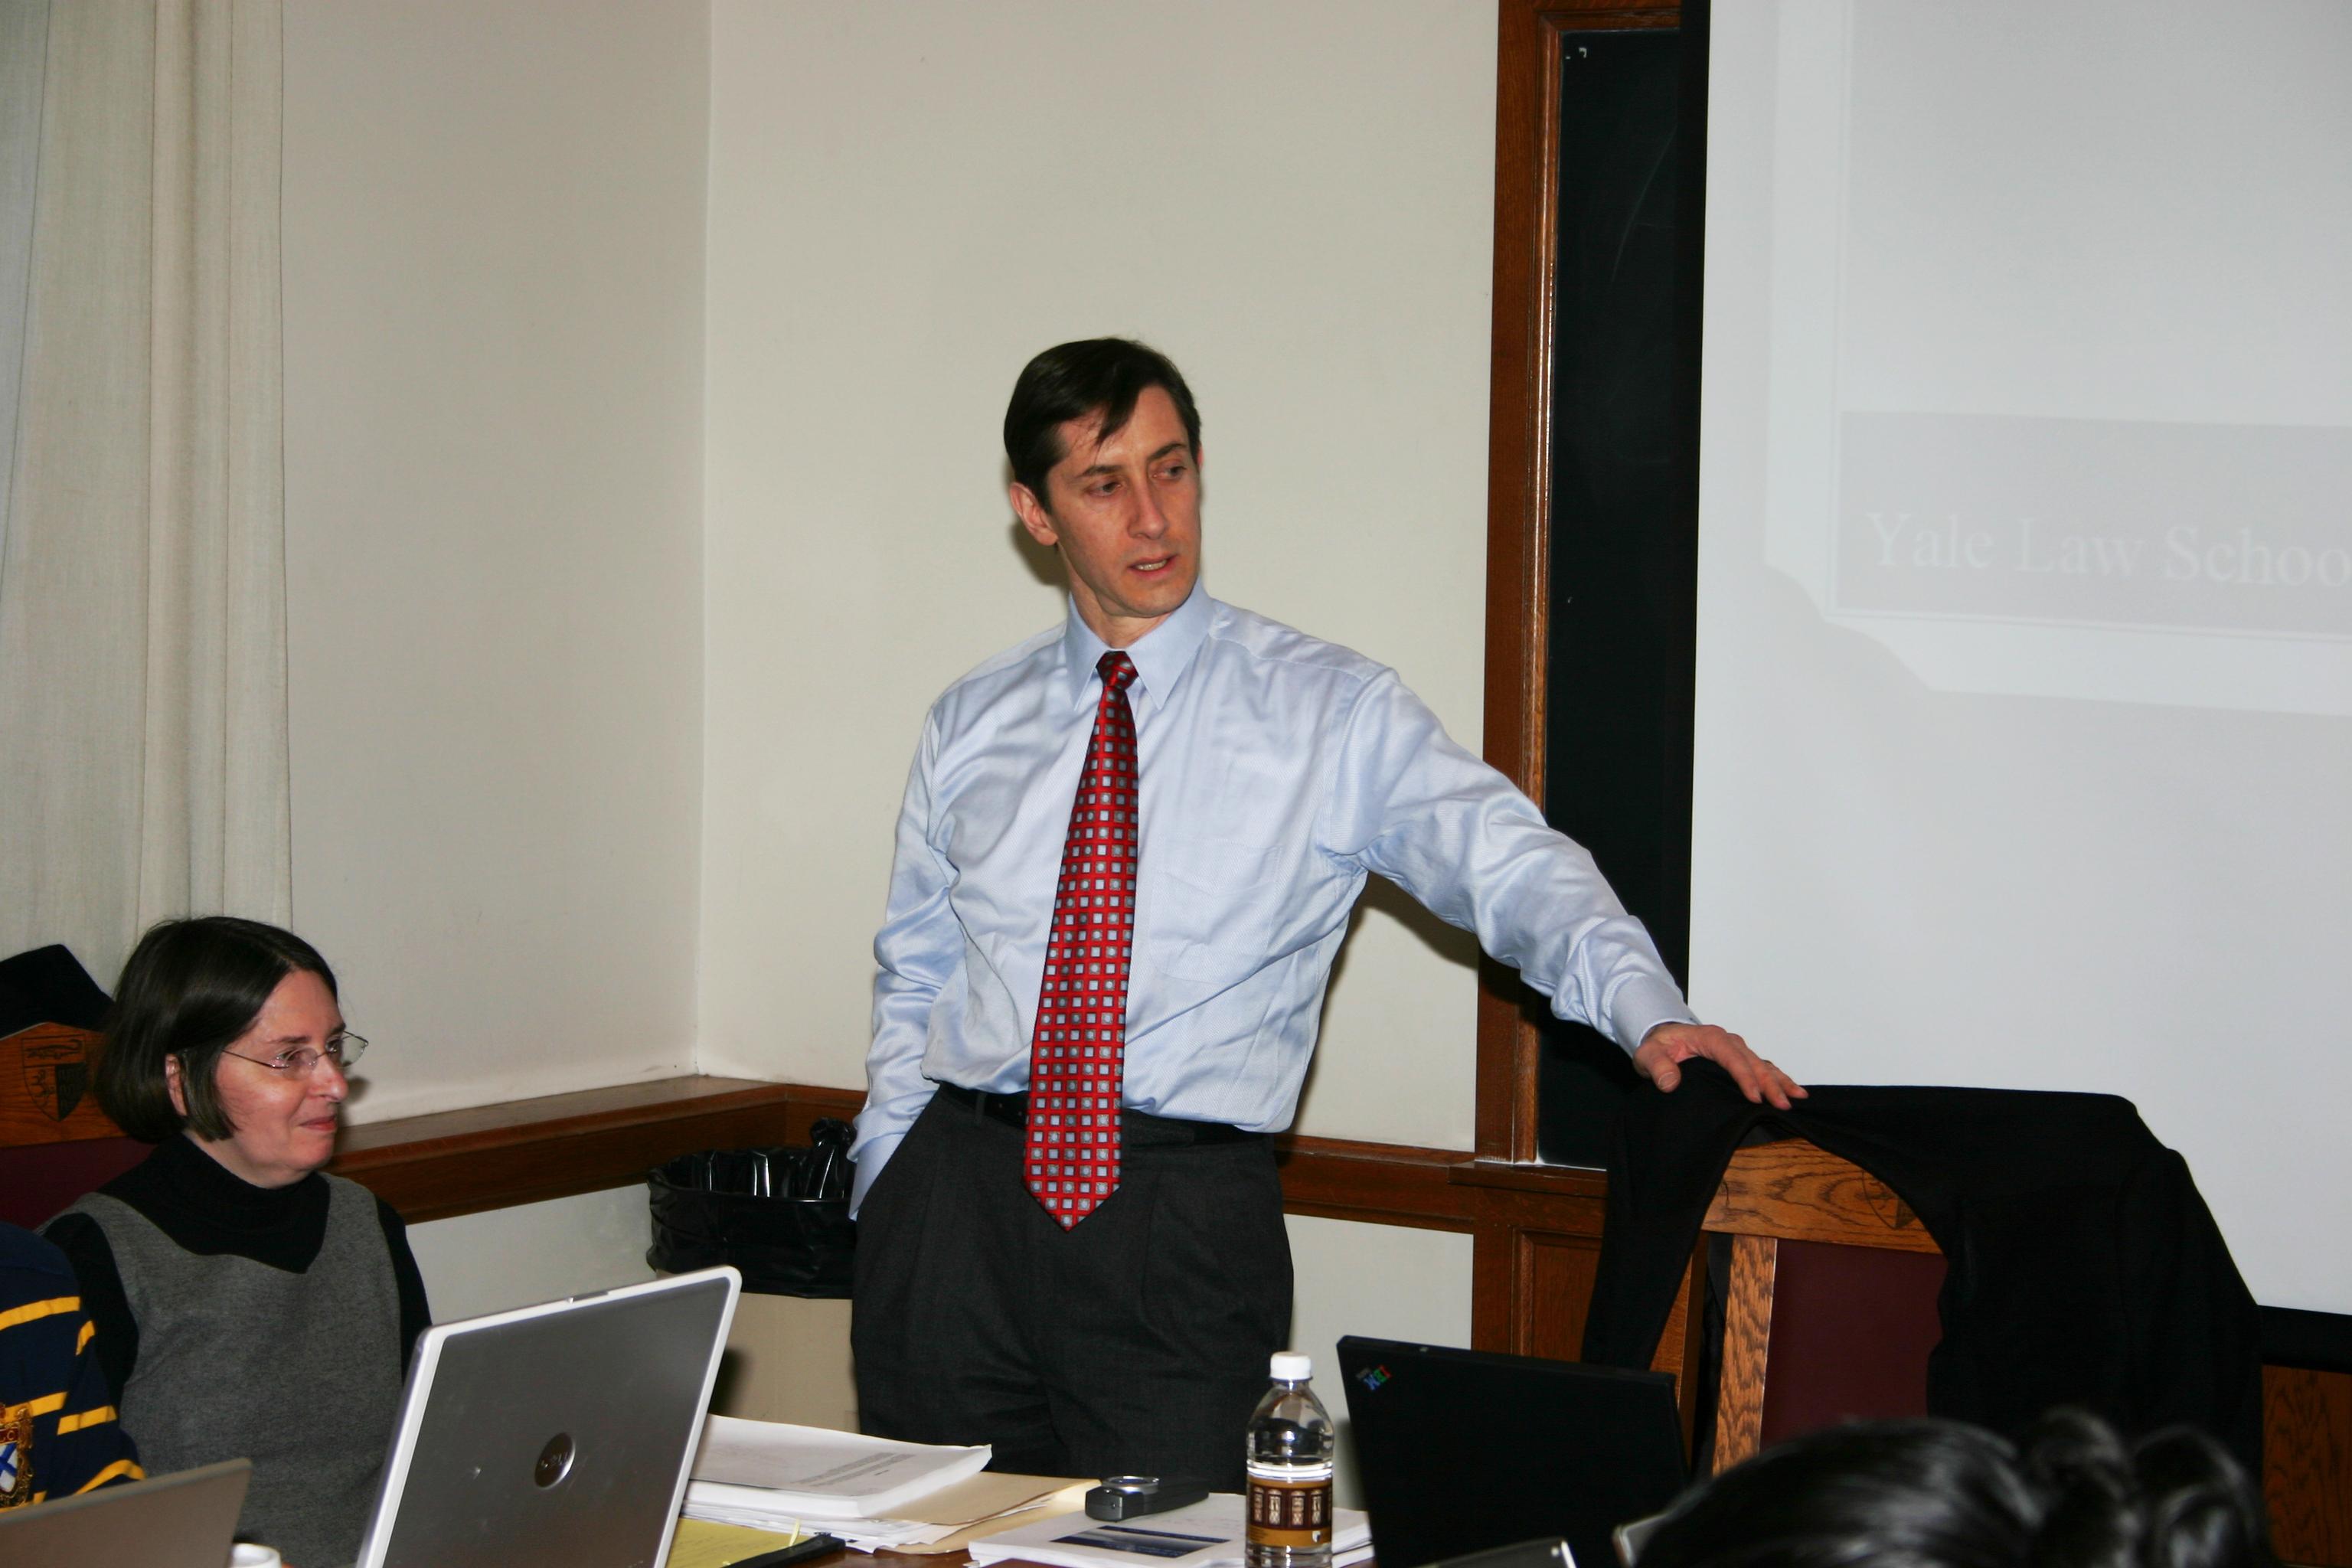 Michael R. Eisenson '81